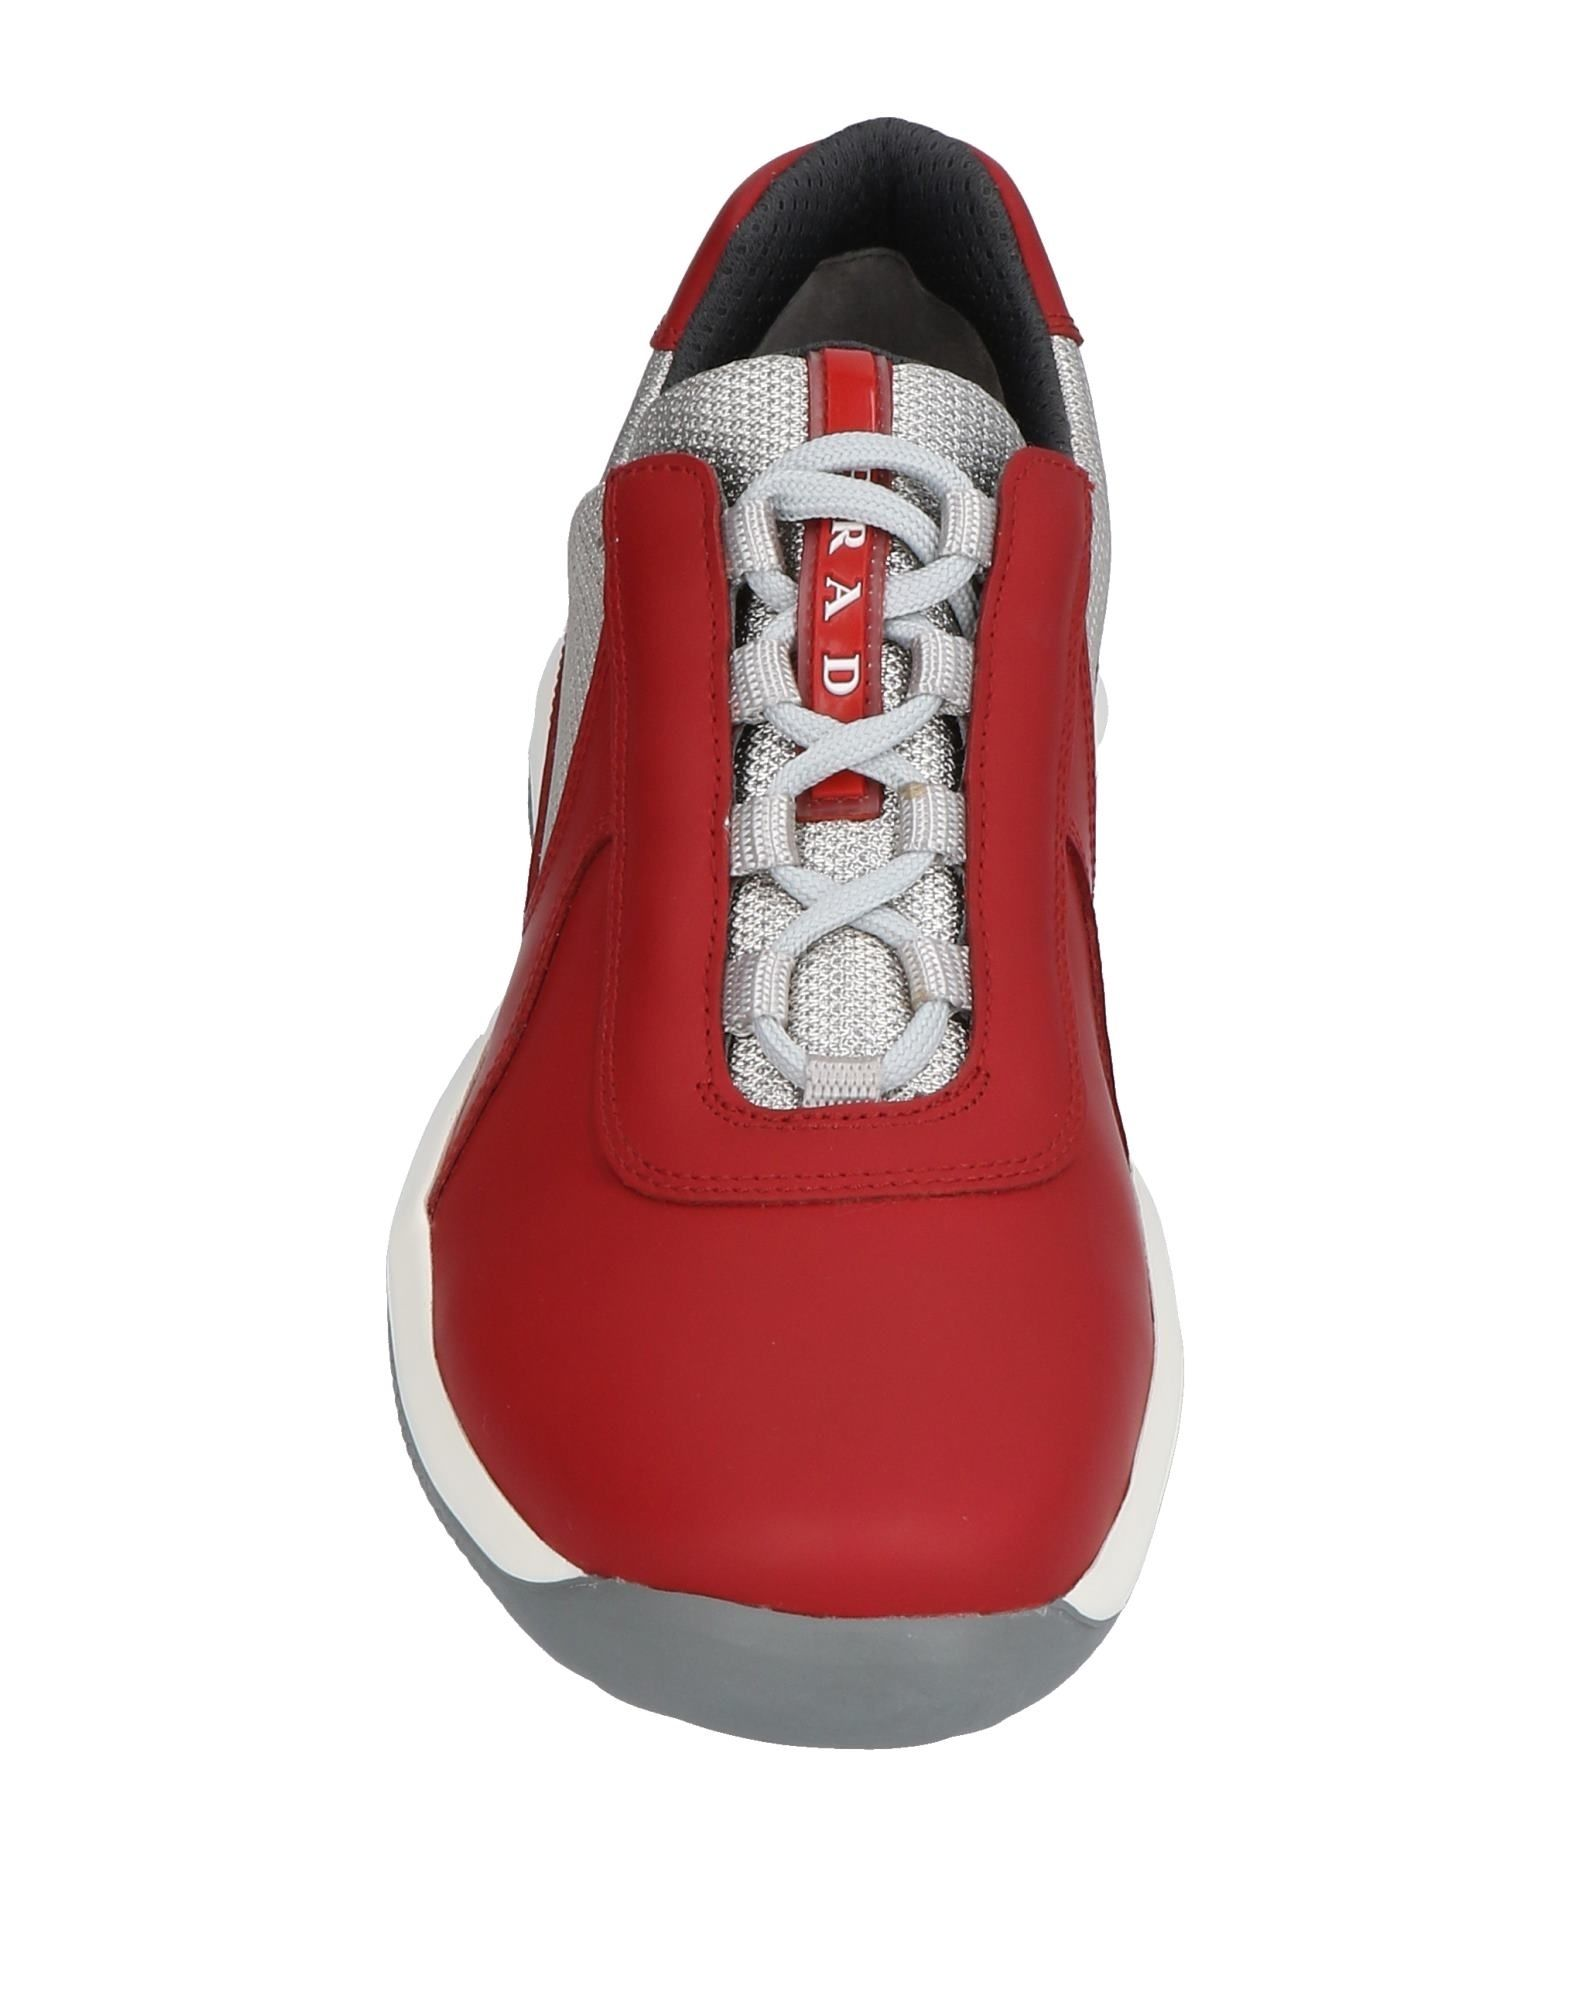 3f58ba83e9d49 ... Prada Schuhe Sport Sneakers Herren 11492757BX Gute Qualität beliebte Schuhe  Prada da06f7 ...